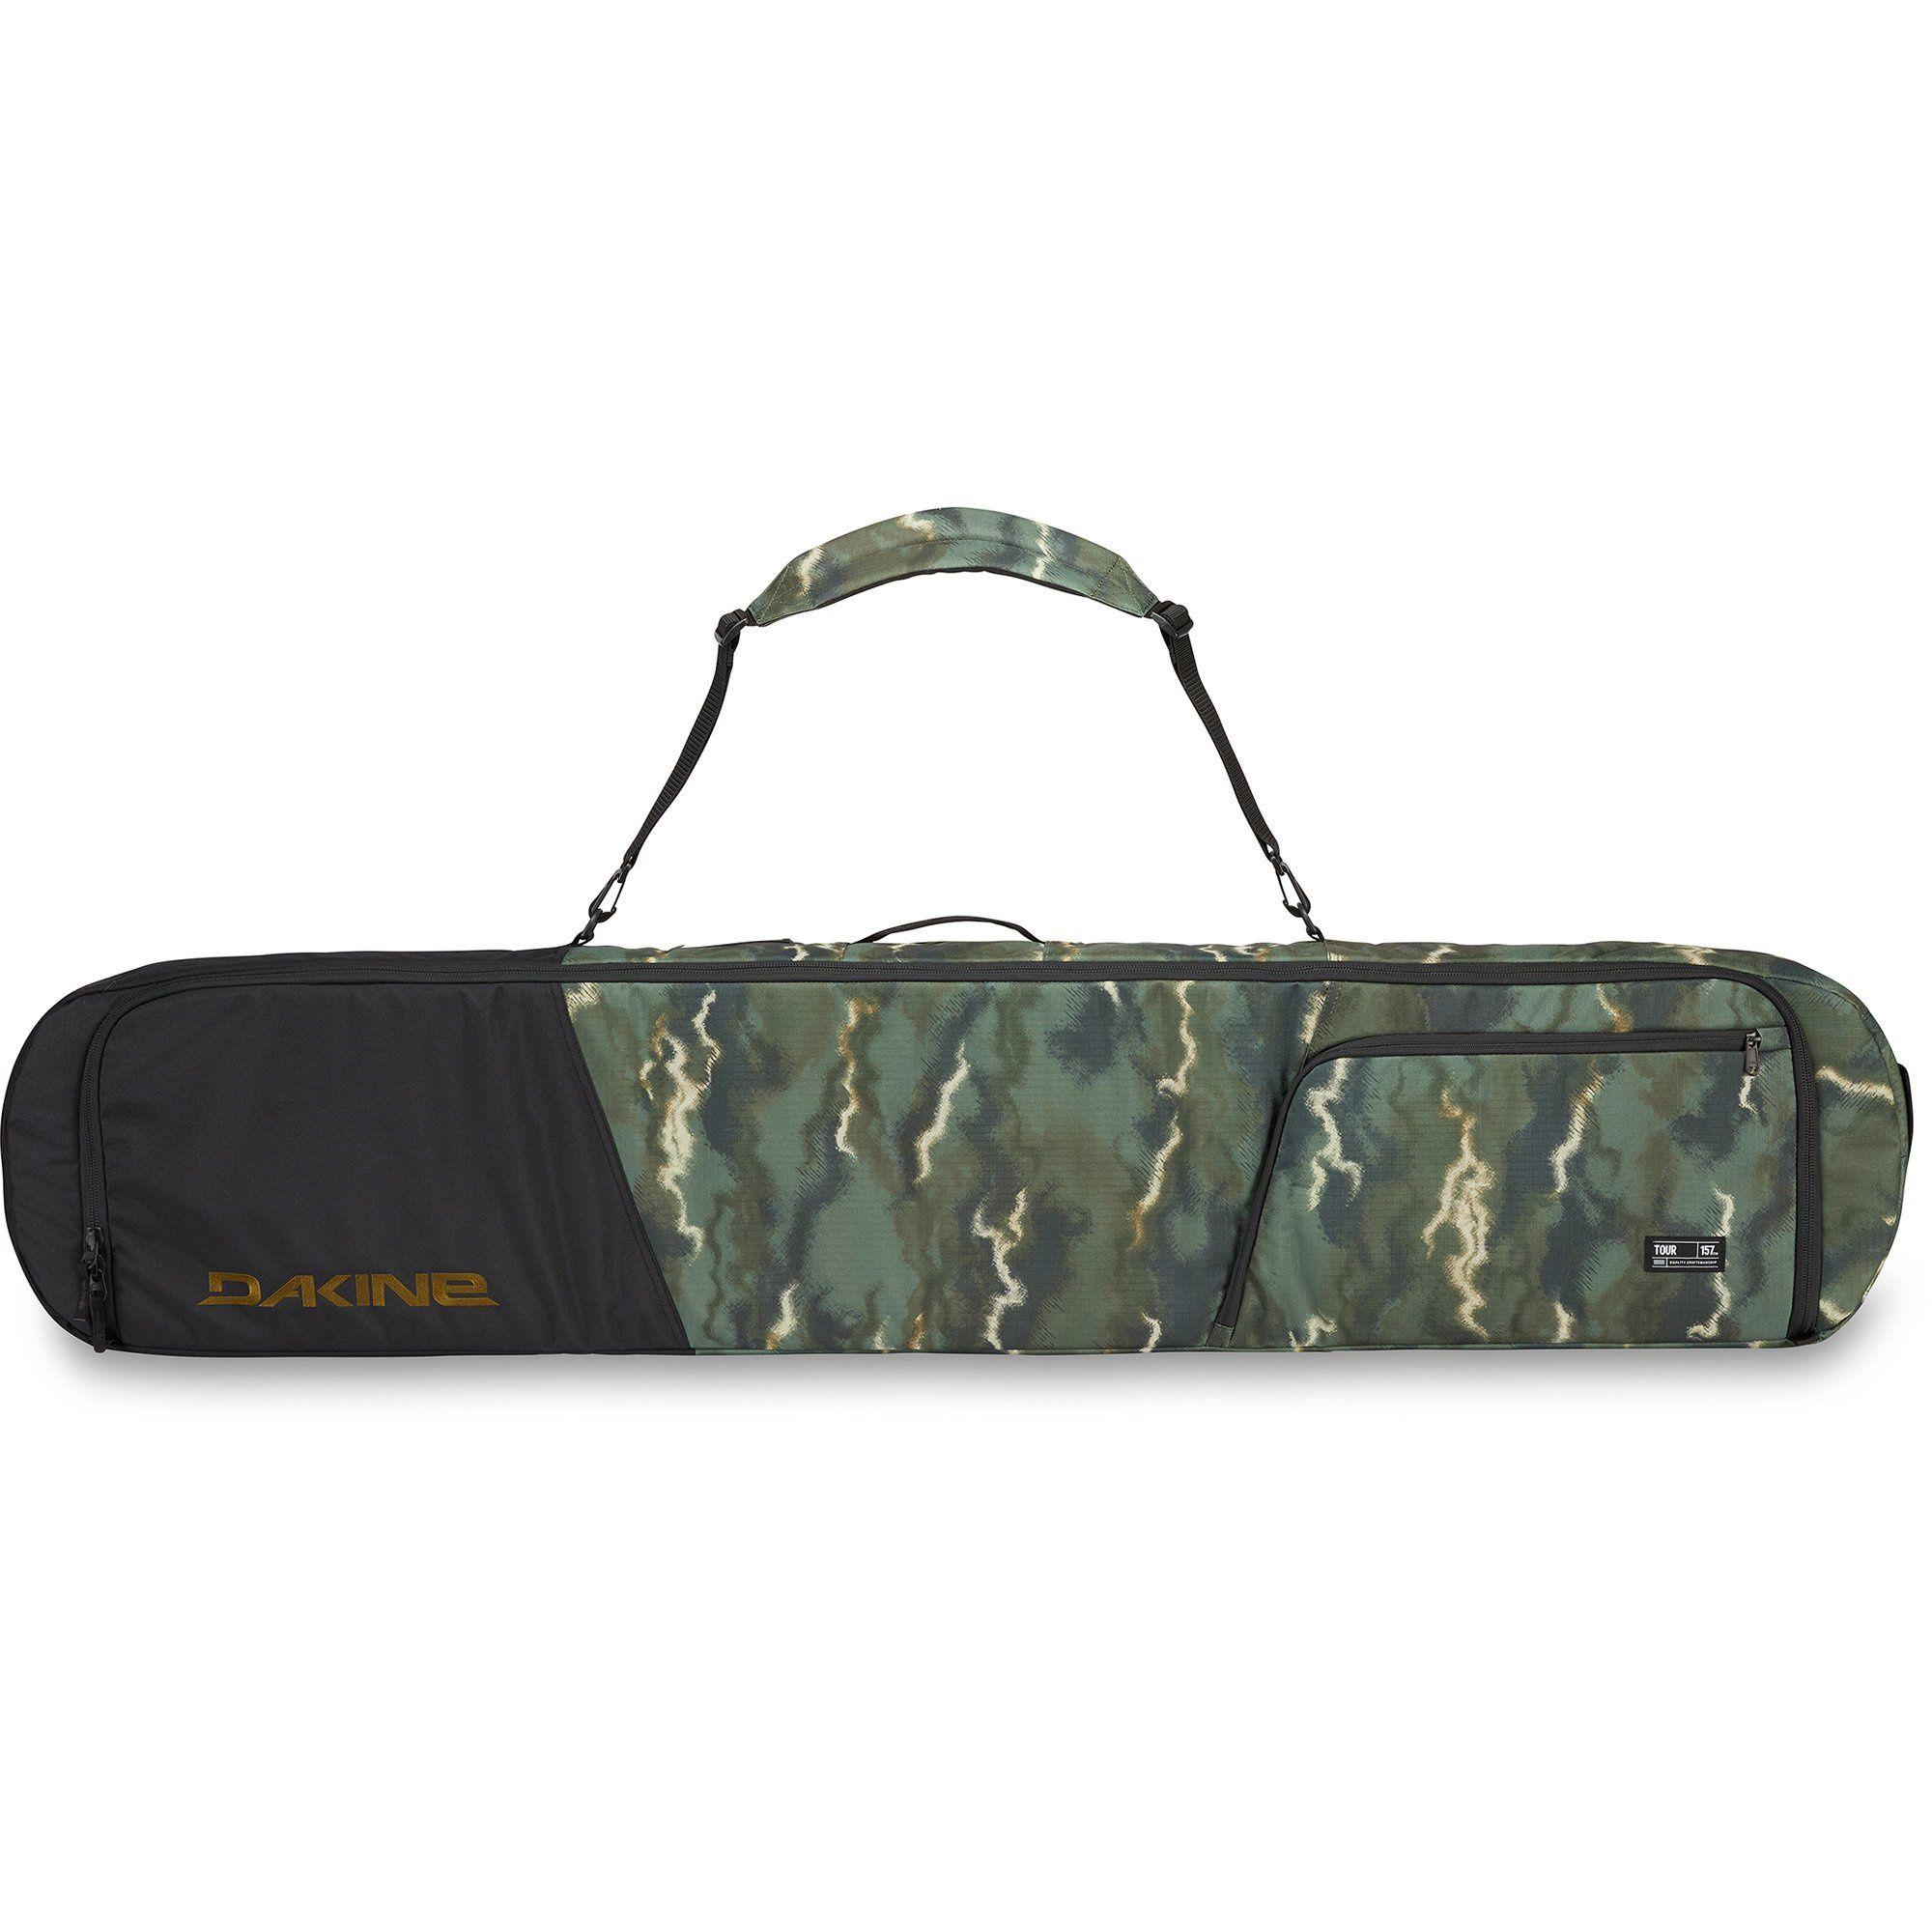 Dakine snowboardbag Tour